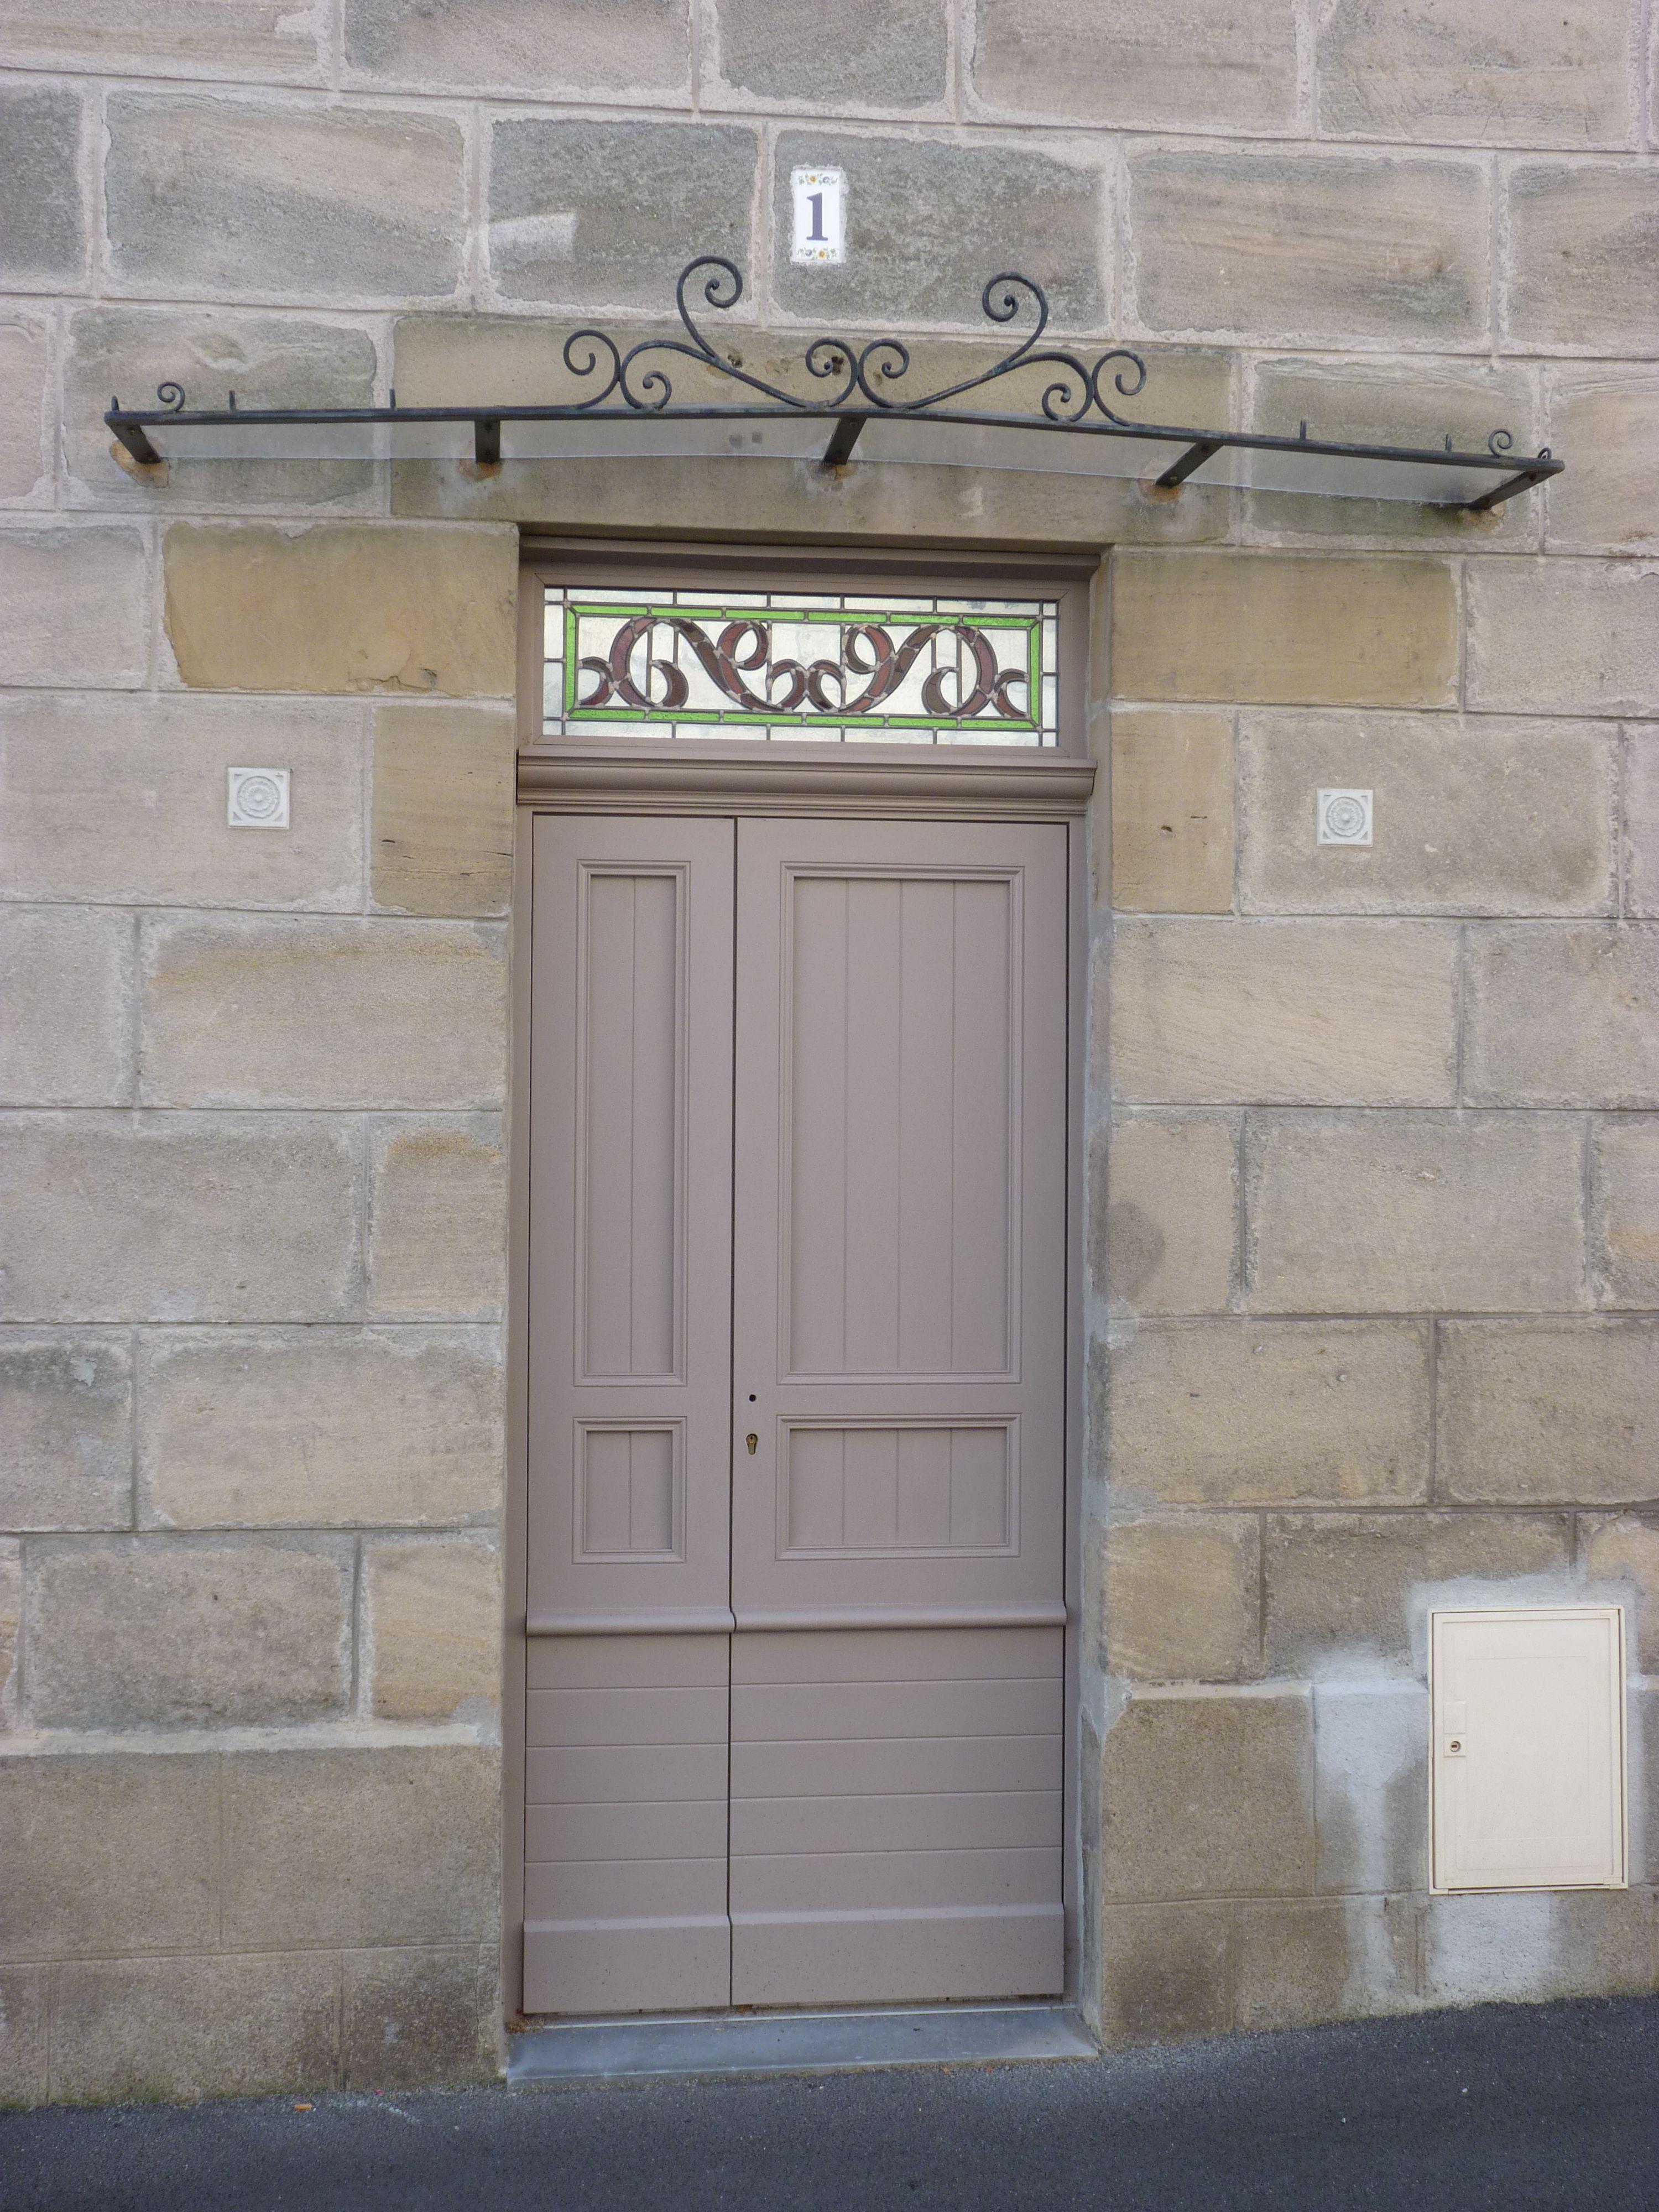 Porte d 39 entr e tierc e avec lames horizontales r guli res lames verticales r guli res et - Porte d entree avec vitrail ...